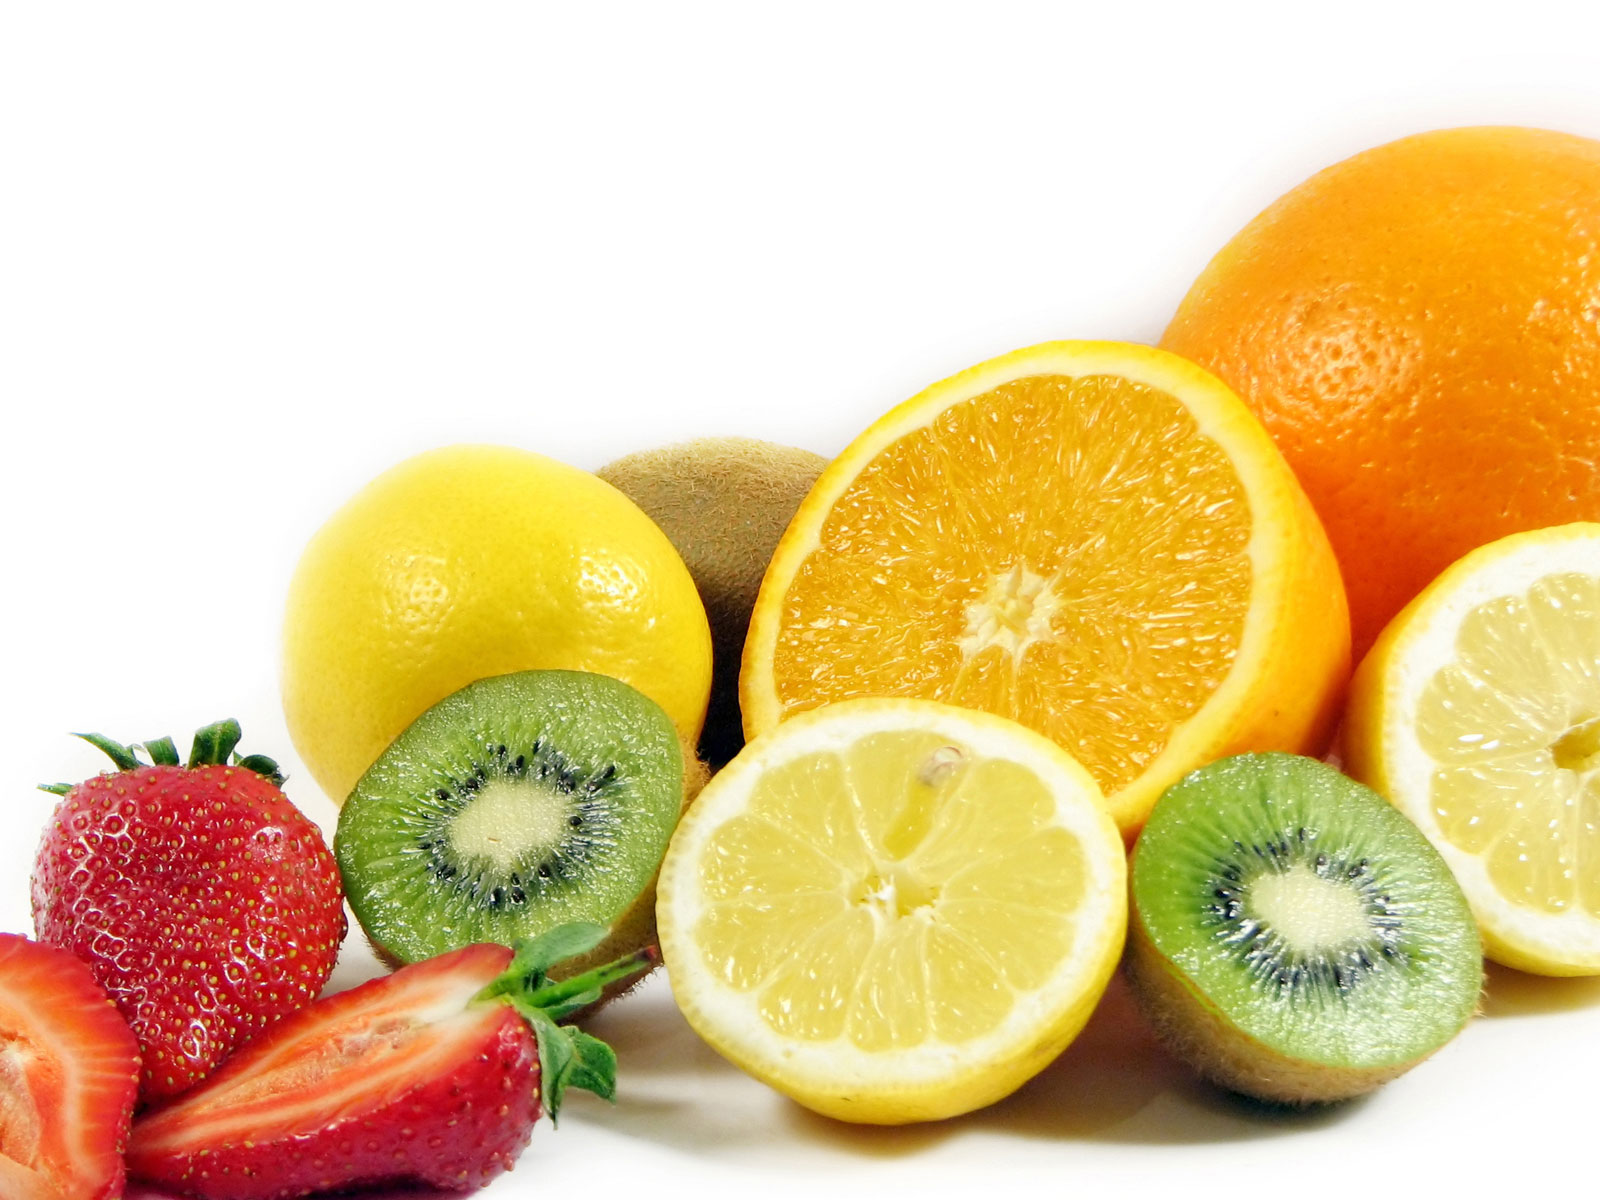 Fresh Fruits Wallpapers Desktop Mix Fruits Mobile Wallpaper 1600x1200